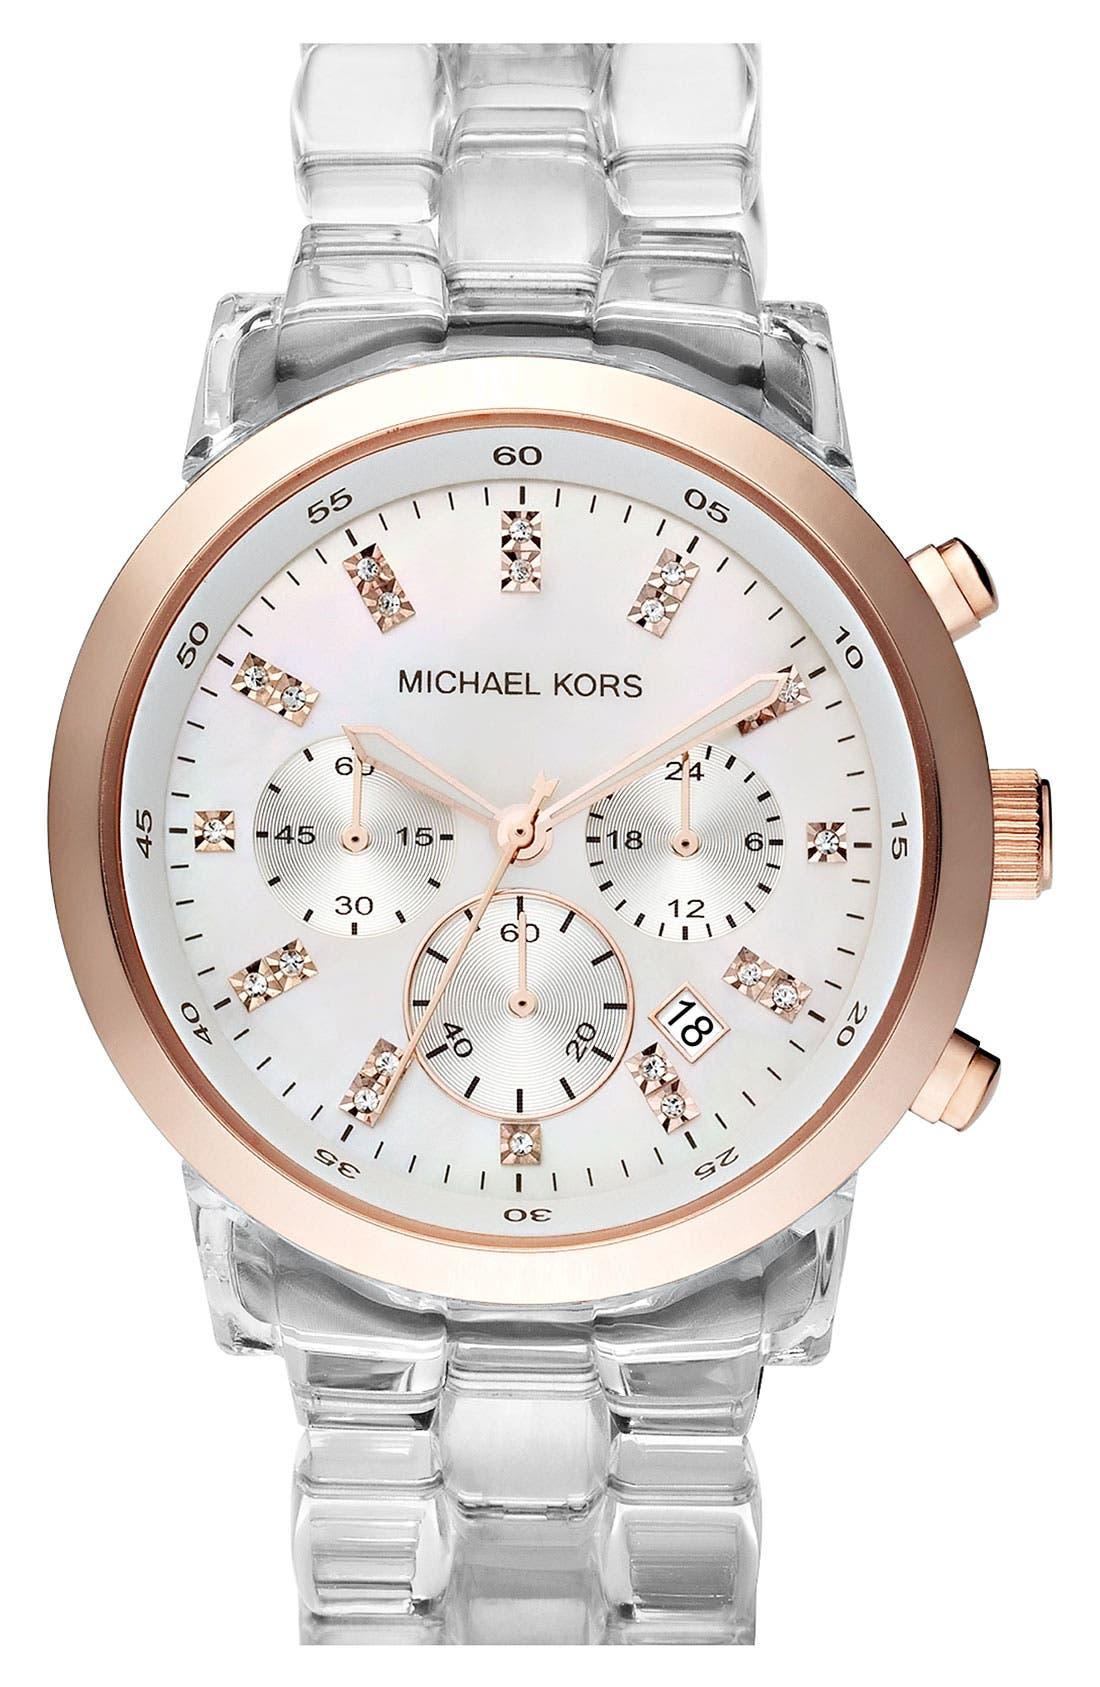 Michael Kors 'Show Stopper' Resin Watch,                             Main thumbnail 1, color,                             960